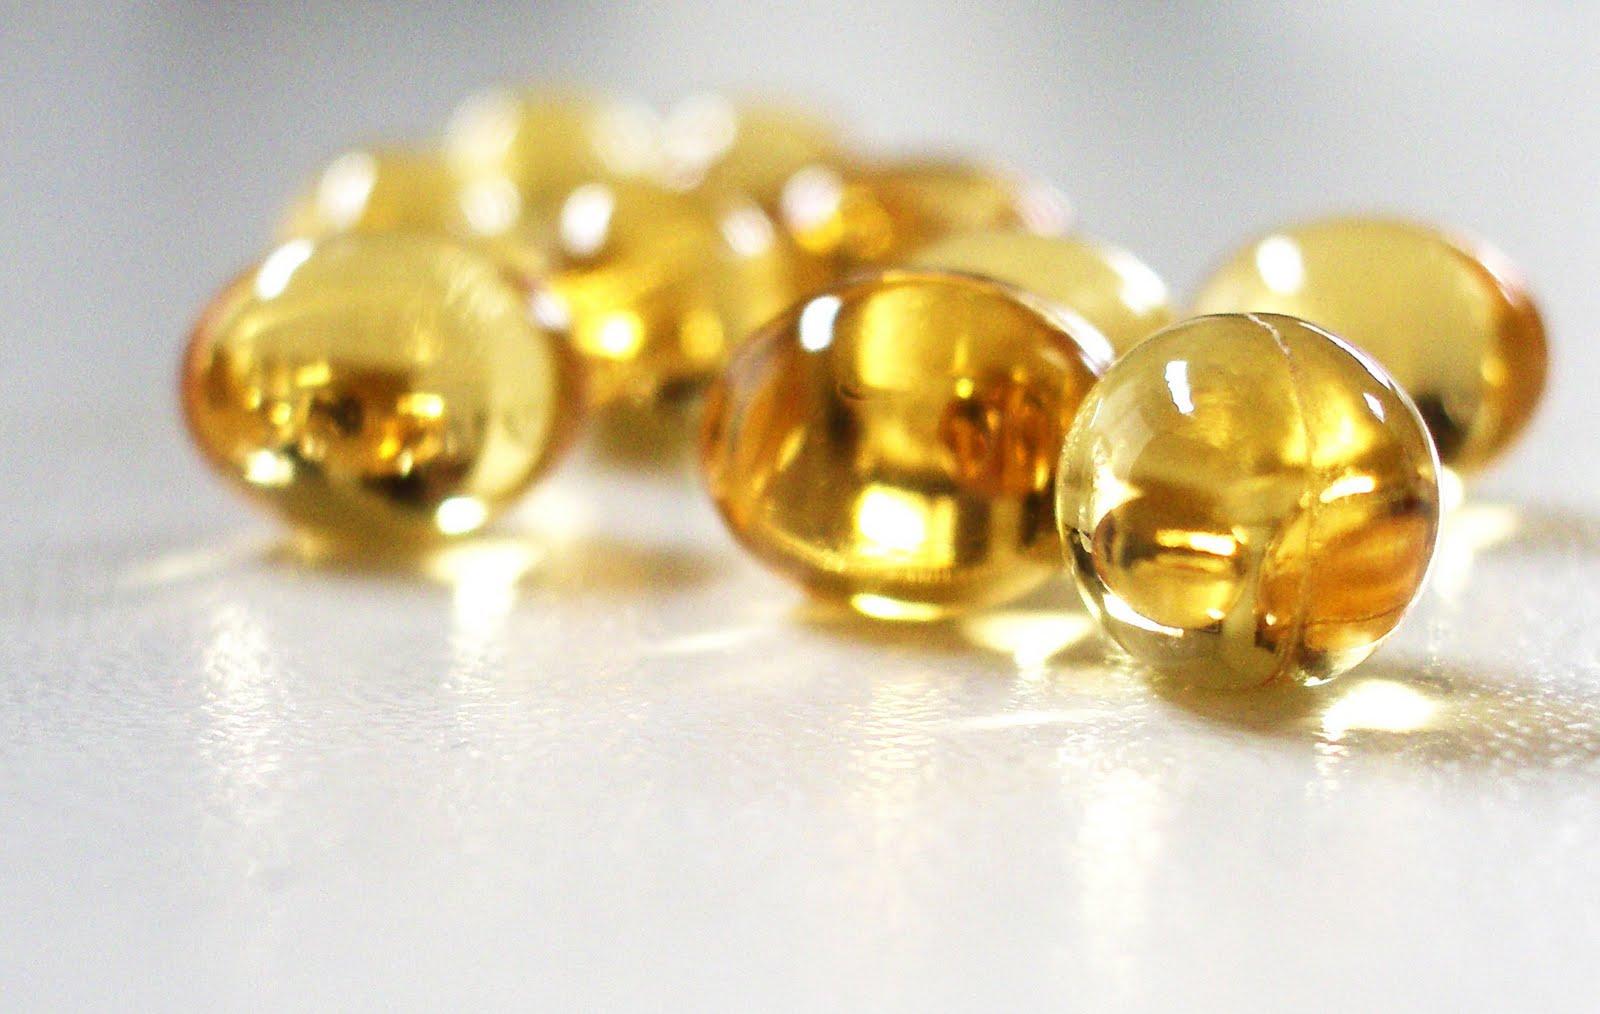 tri-seo-loi-bang-vitamin-e-31